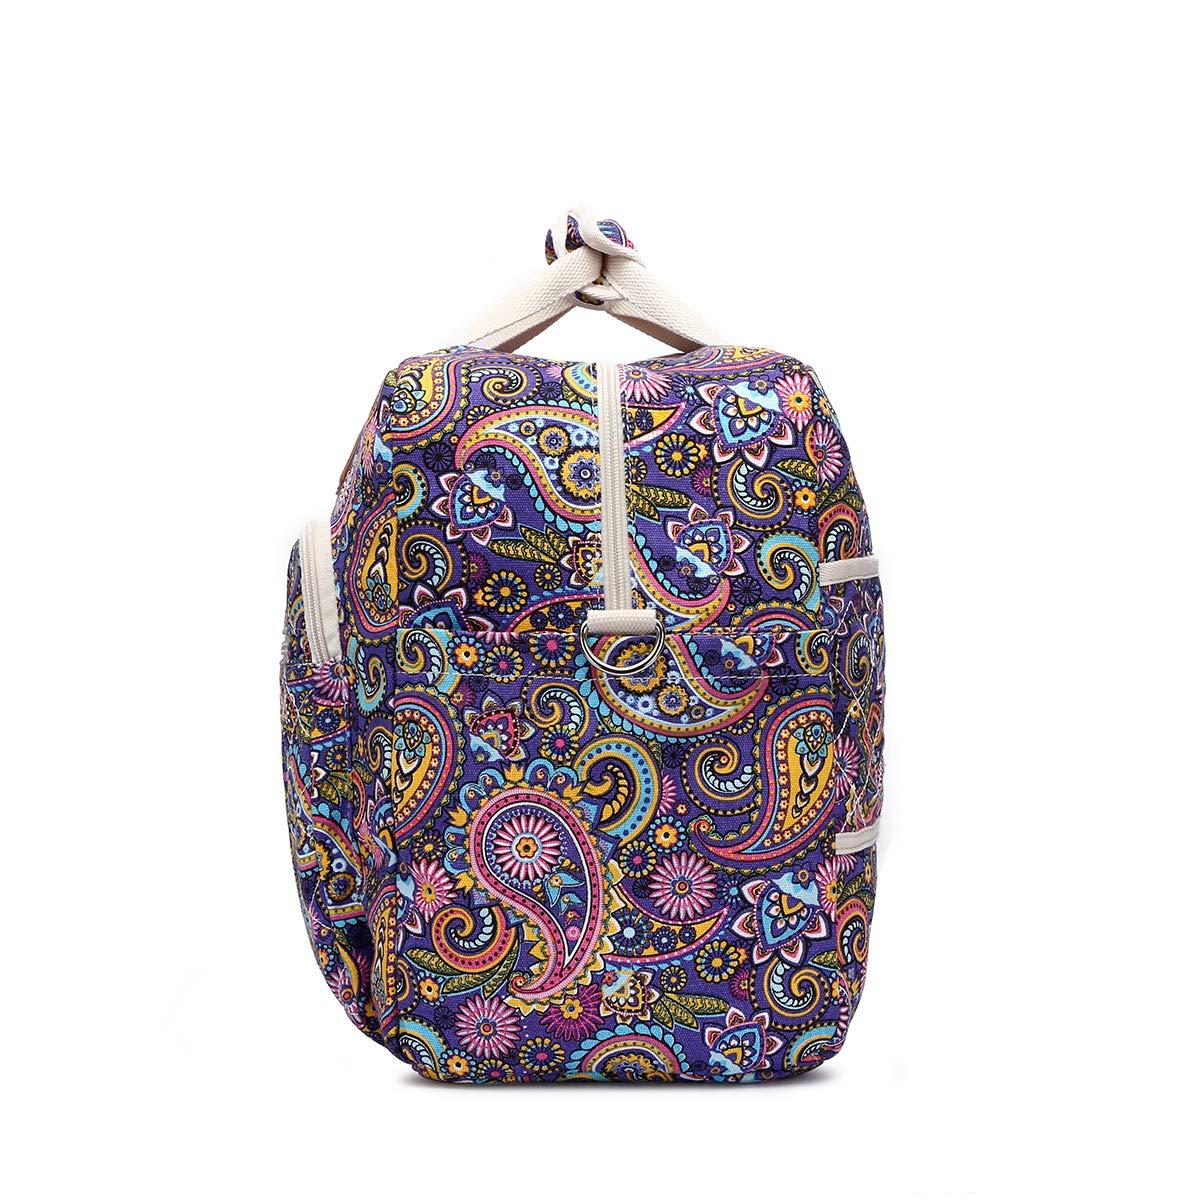 Malirona Women's Canvas Overnight Weekender Bag Carry On Travel Duffel Tote Bag Bohemian Flower (Purple Flower) by Malirona (Image #3)